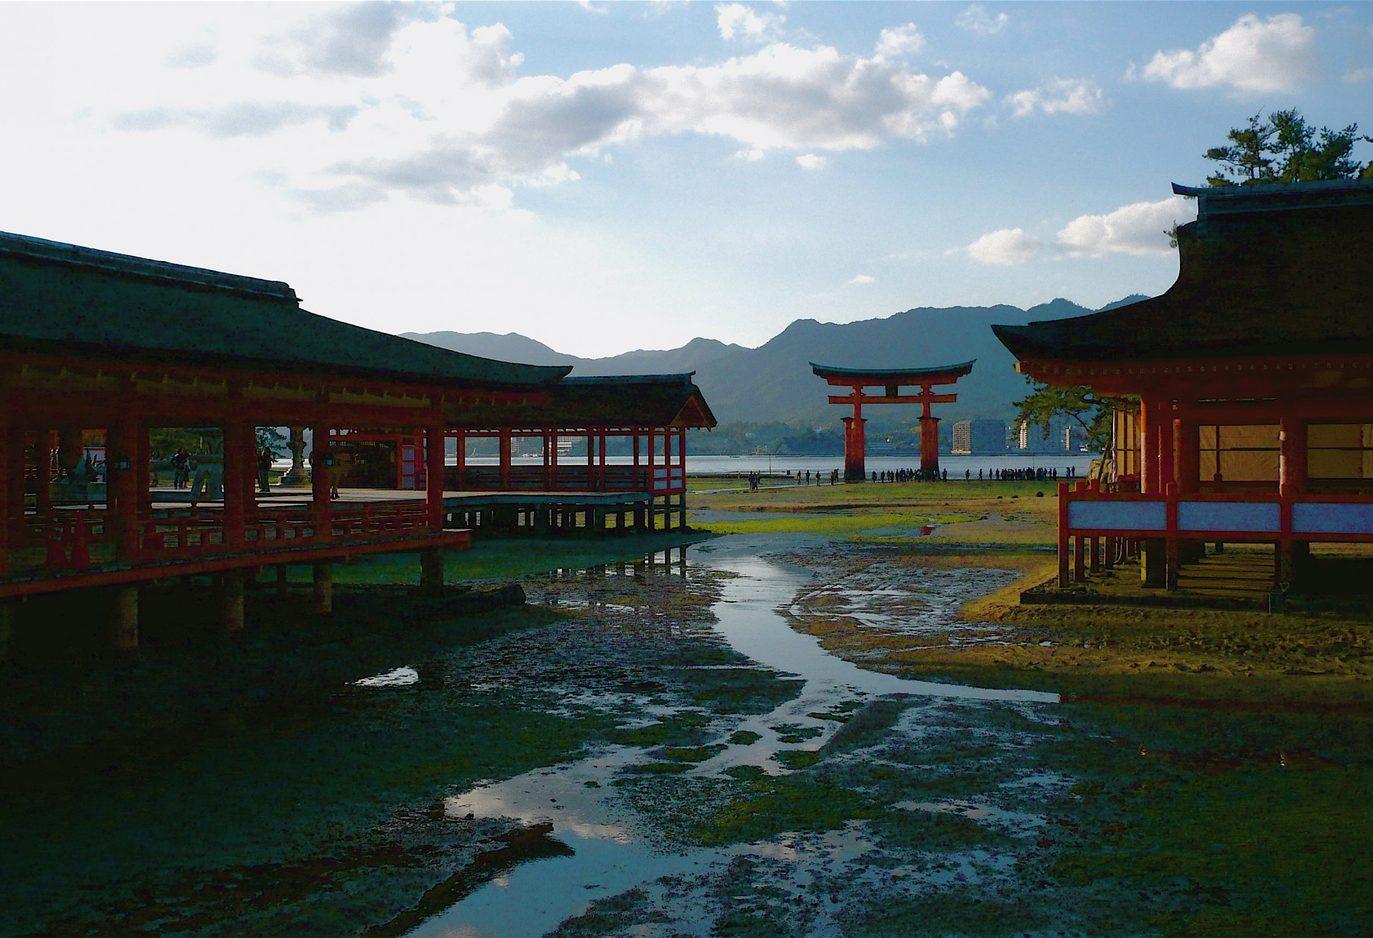 Kansai Gaidai - View from Itsukushima Shrine